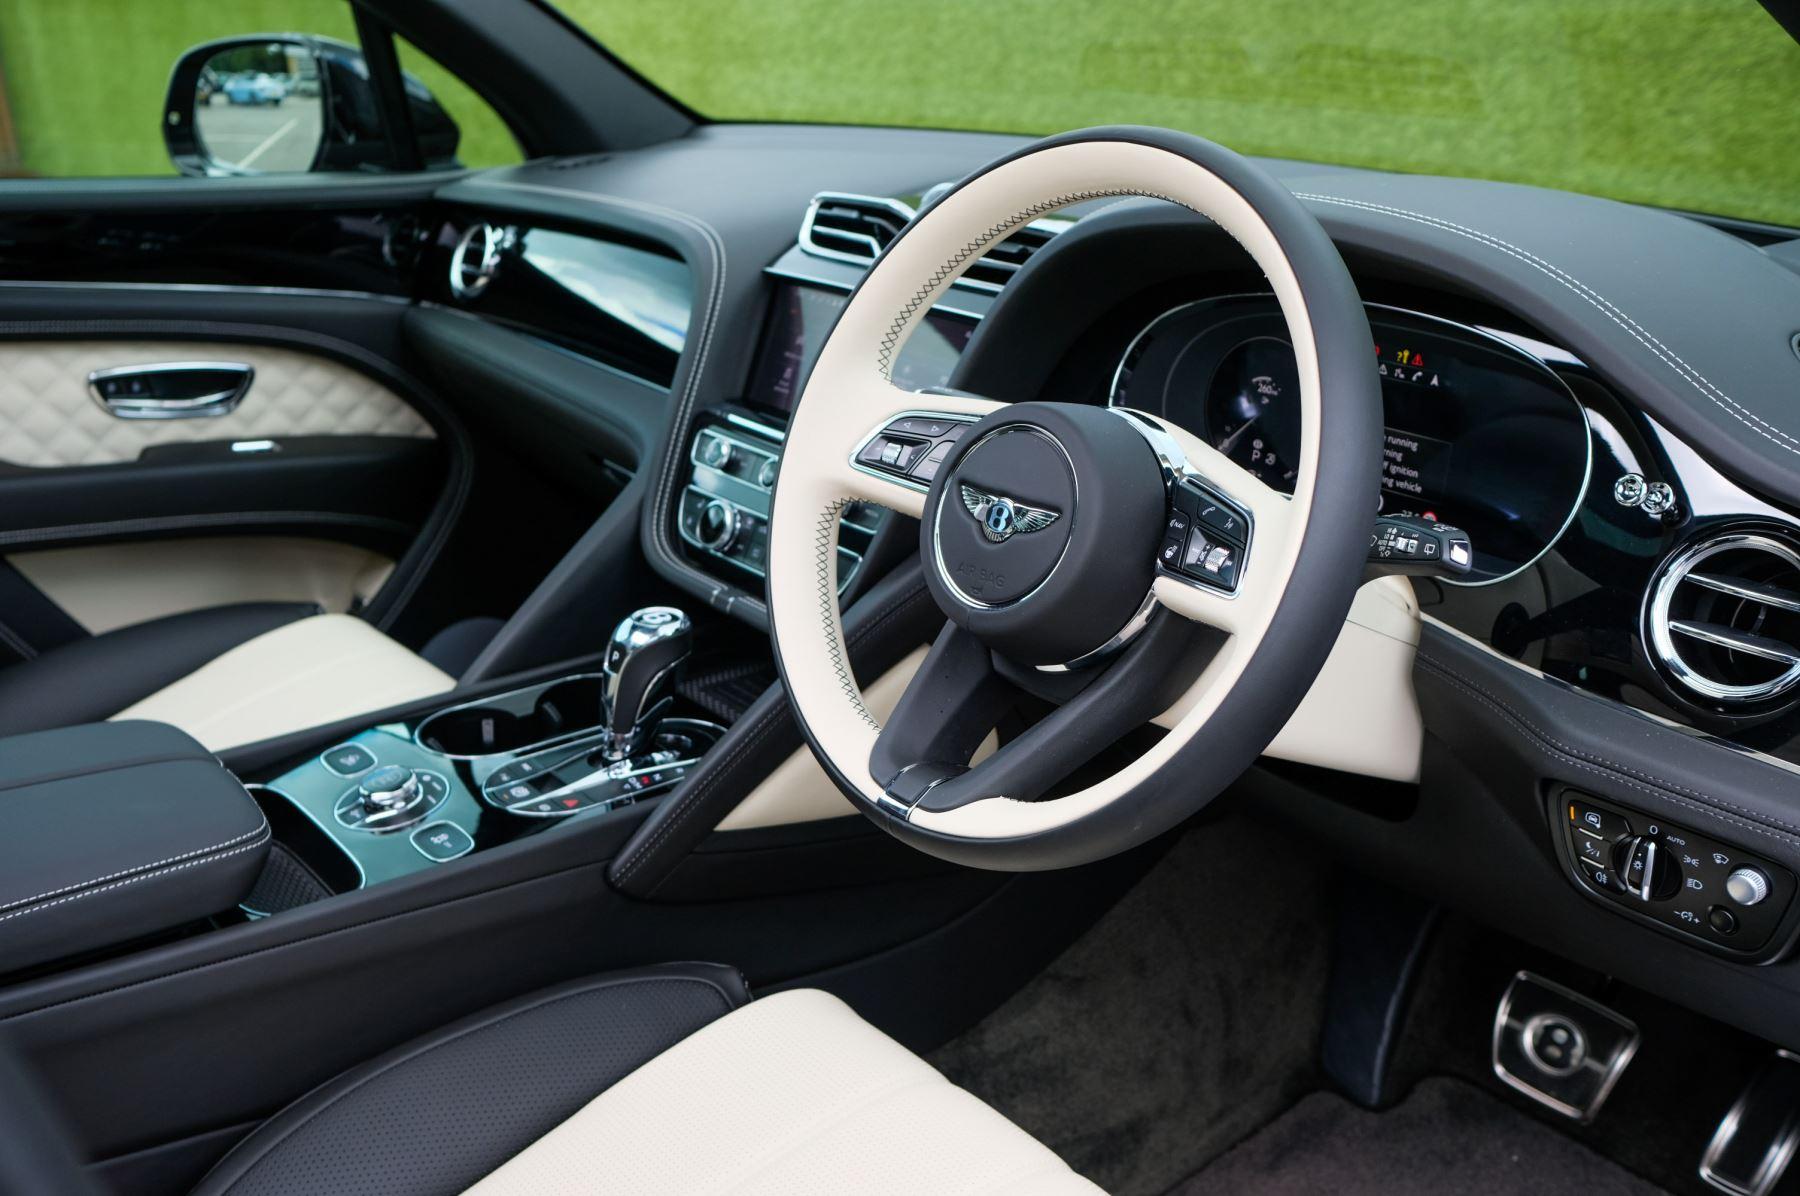 Bentley Bentayga 4.0 V8 - Mulliner Driving Specification for Black Specification image 12